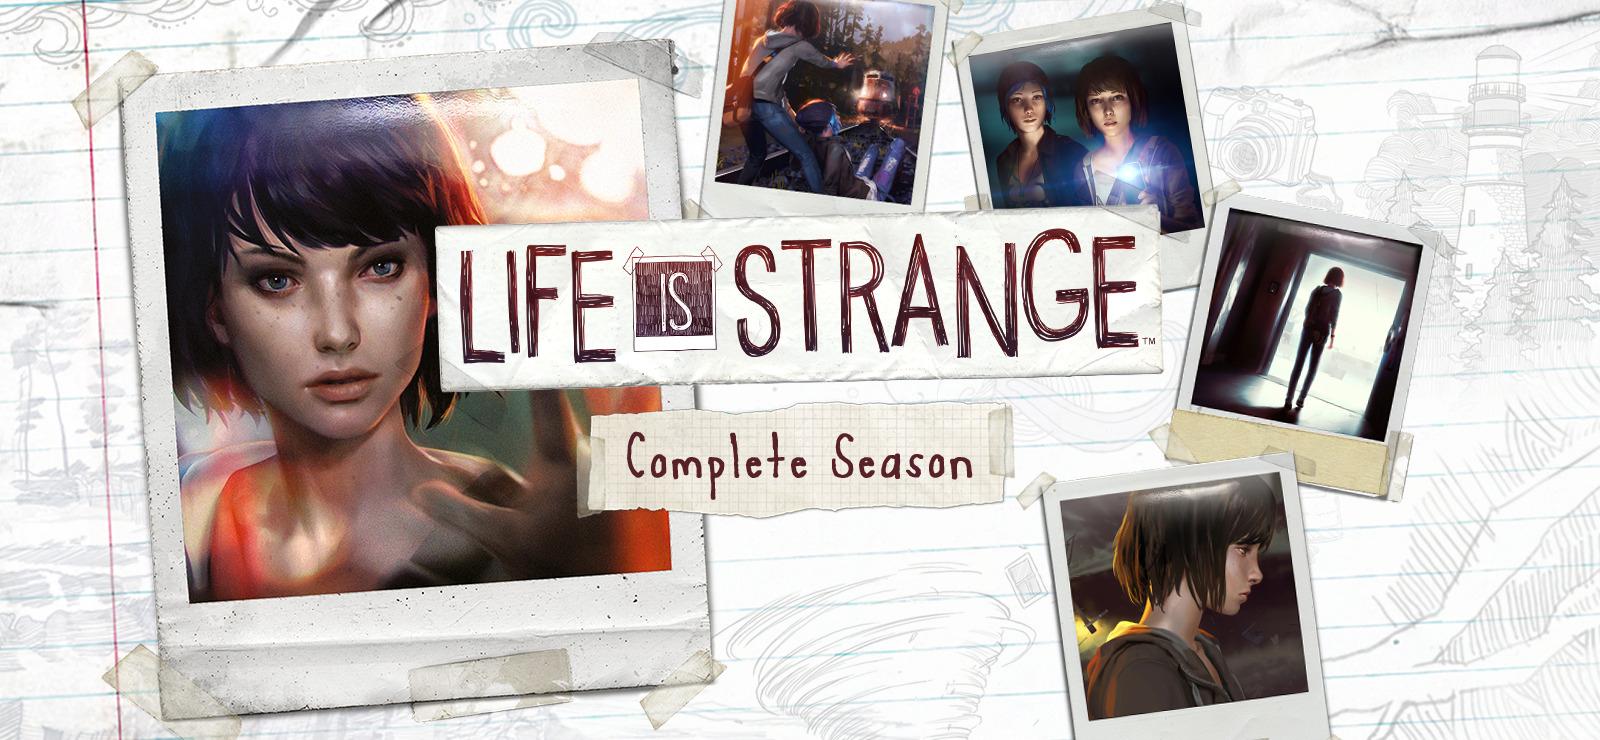 Life is Strange: Complete Season (GOG) por 0,94€ con VPN Rusia / 3,99€ sin VPN